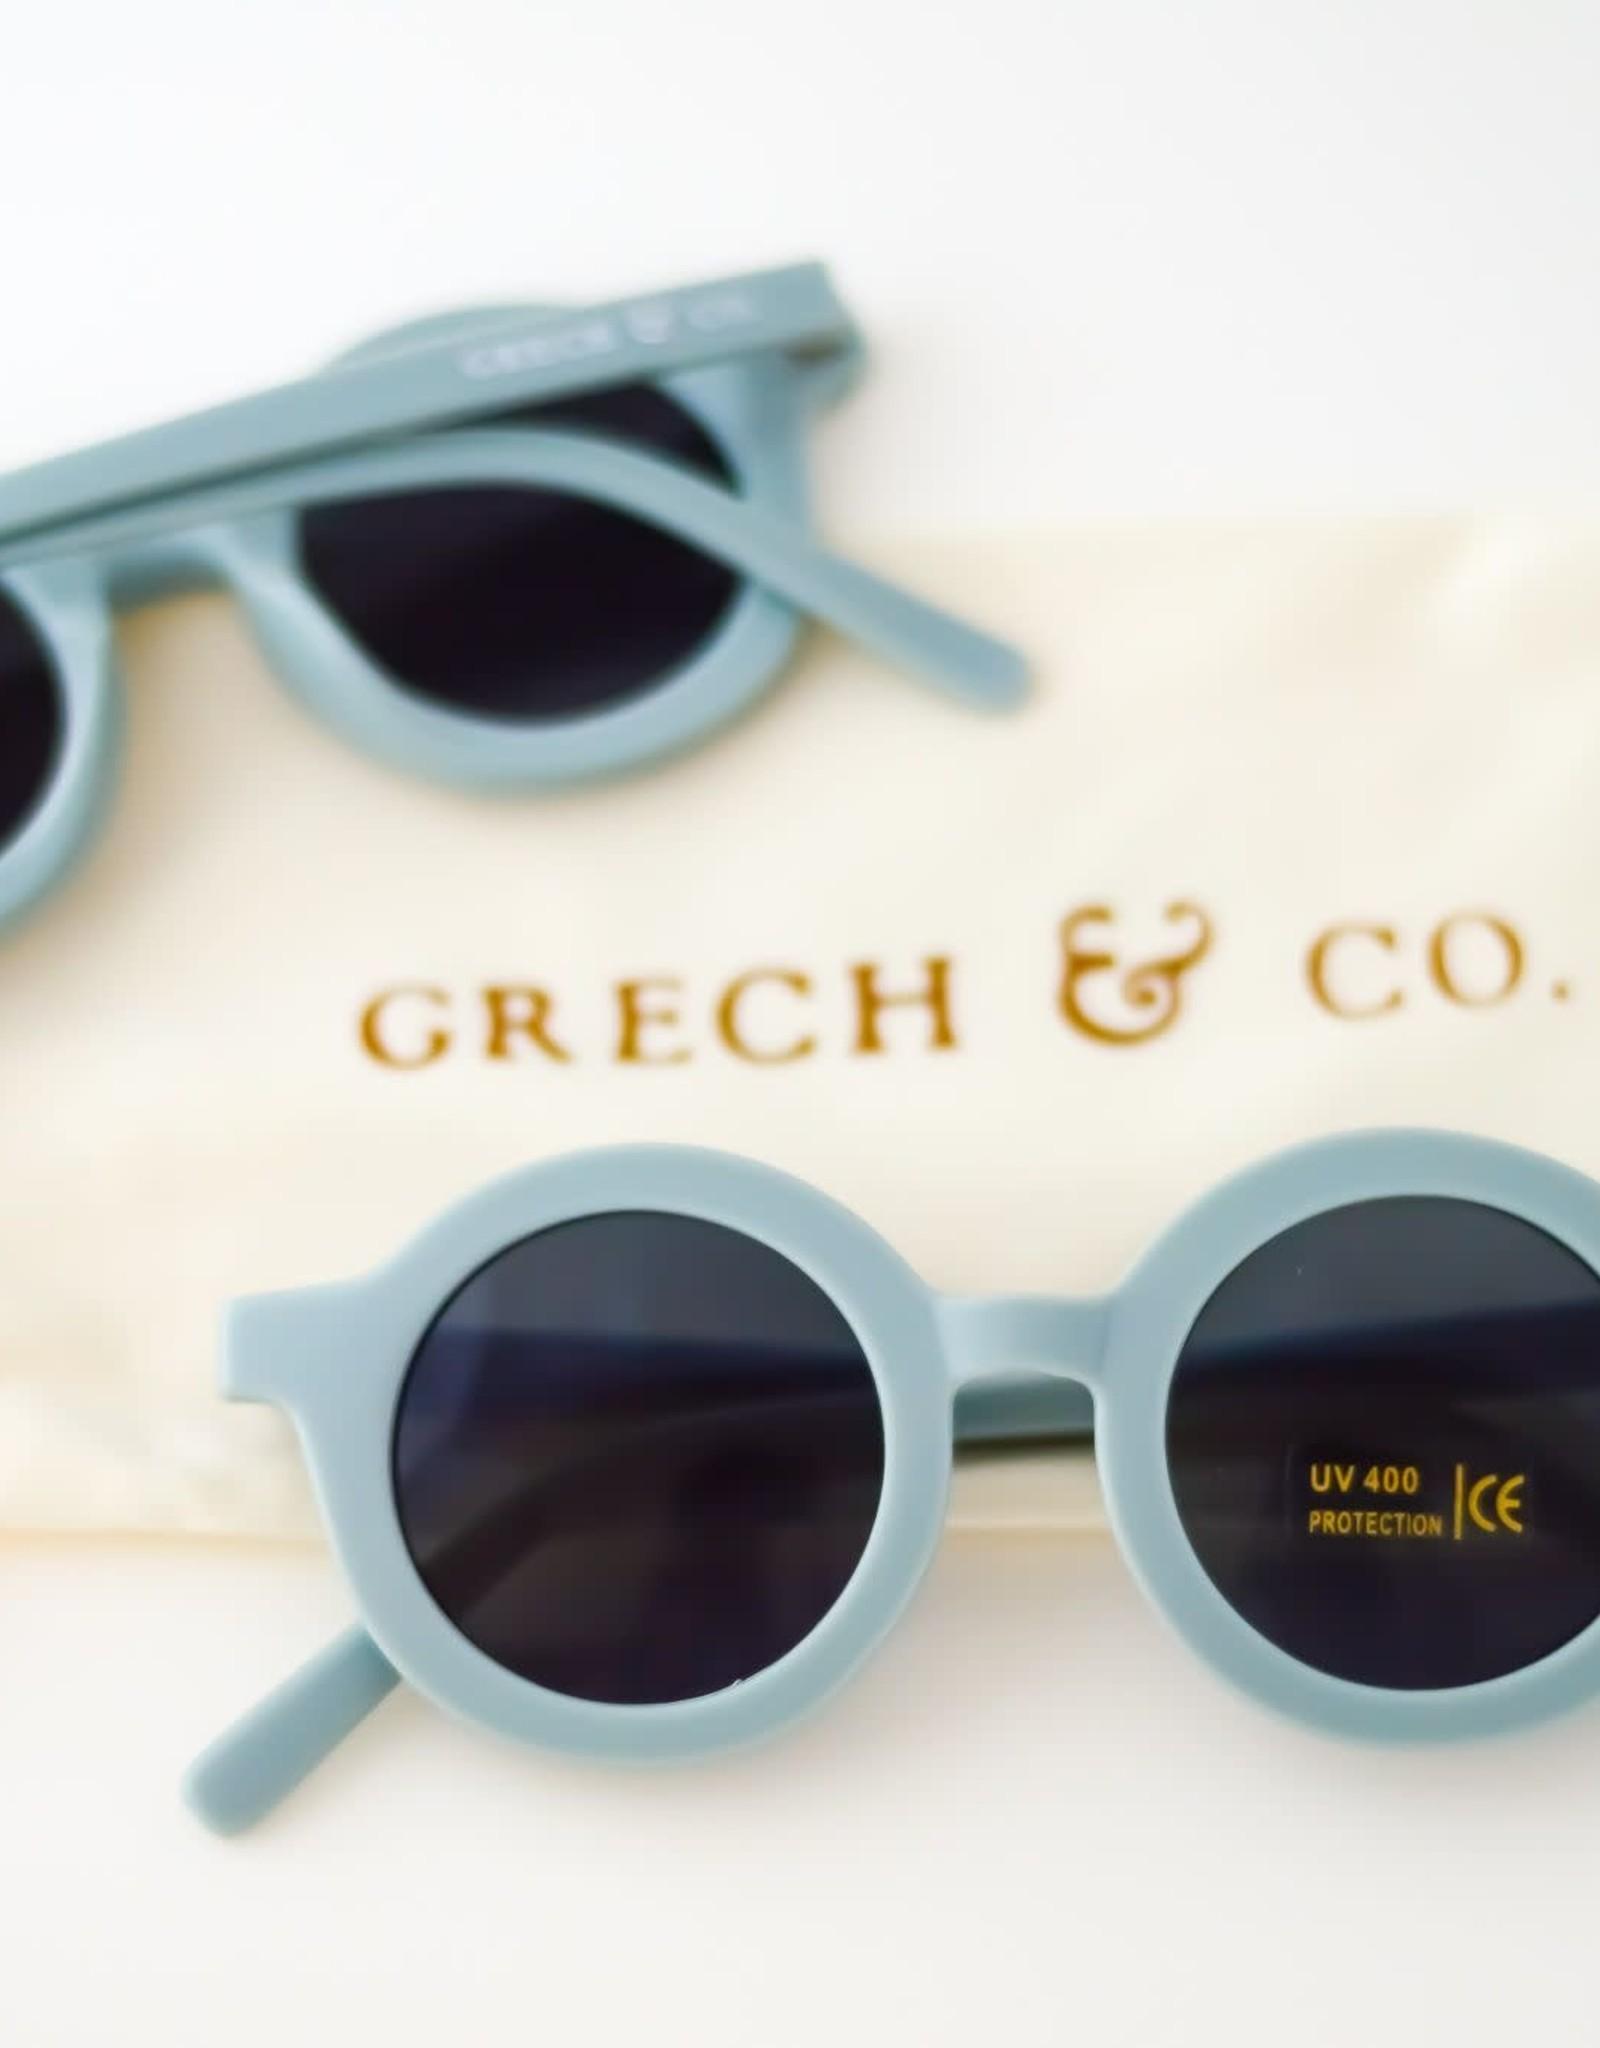 Grech & Co sustainable sunglasses- light blue